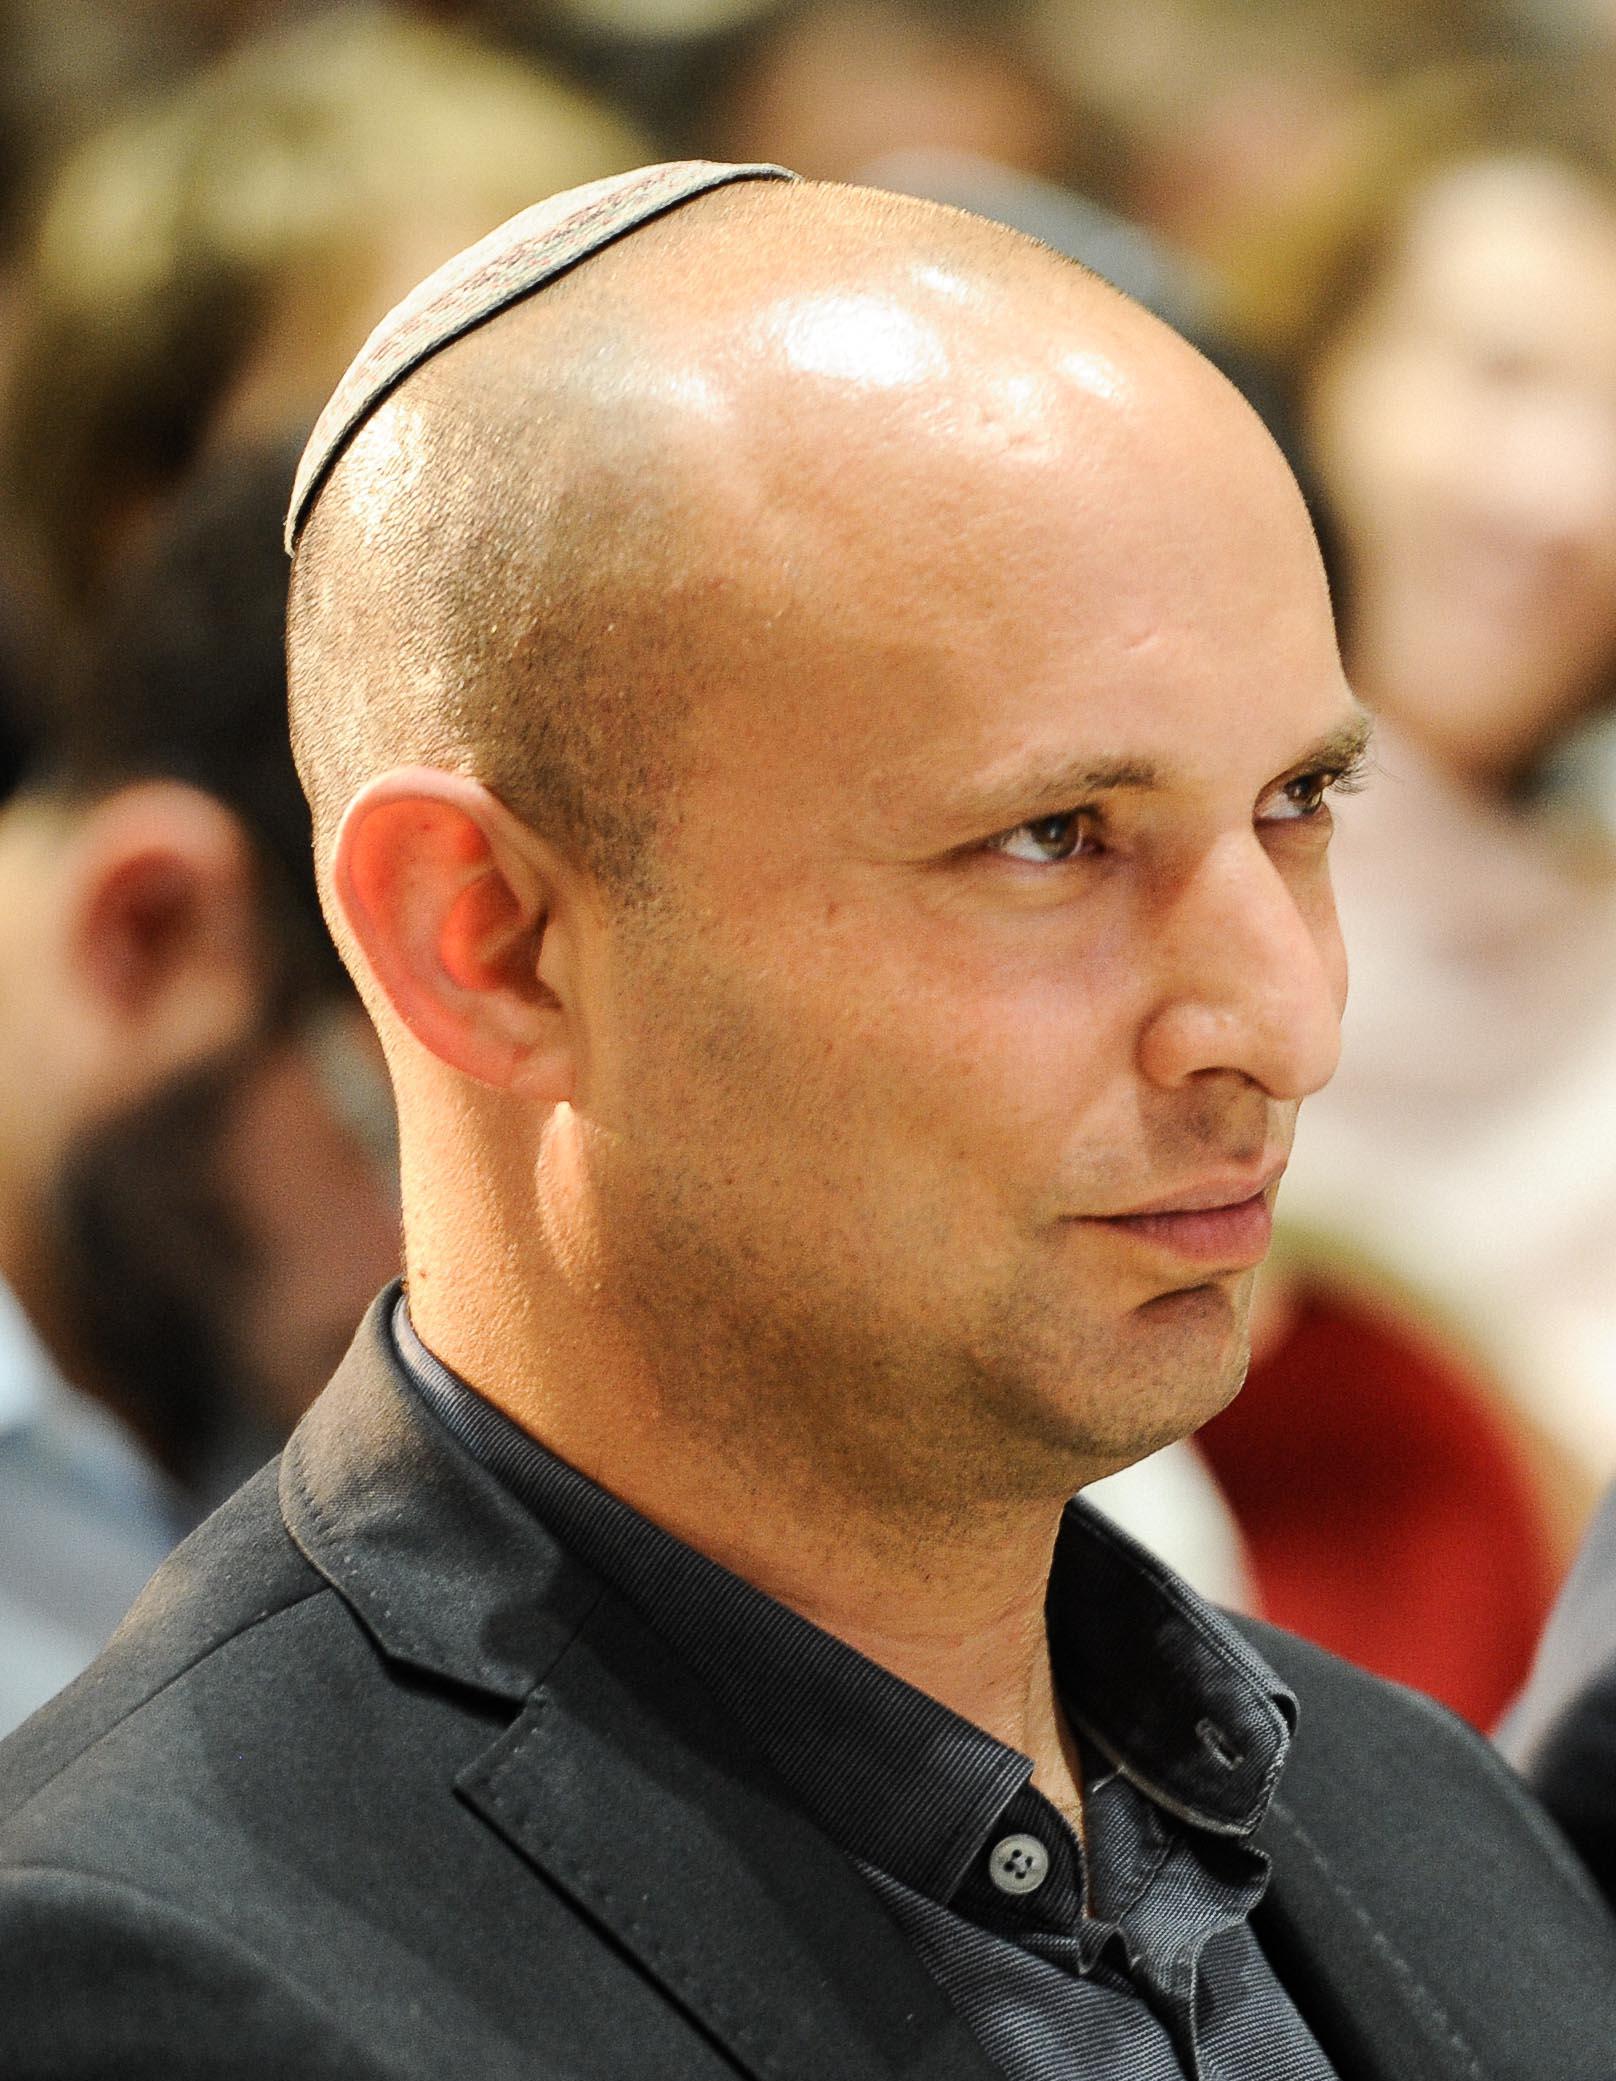 File:Naftali Bennett - Herzliya Conference 2016 1183 (cropped).jpg -  Wikimedia Commons